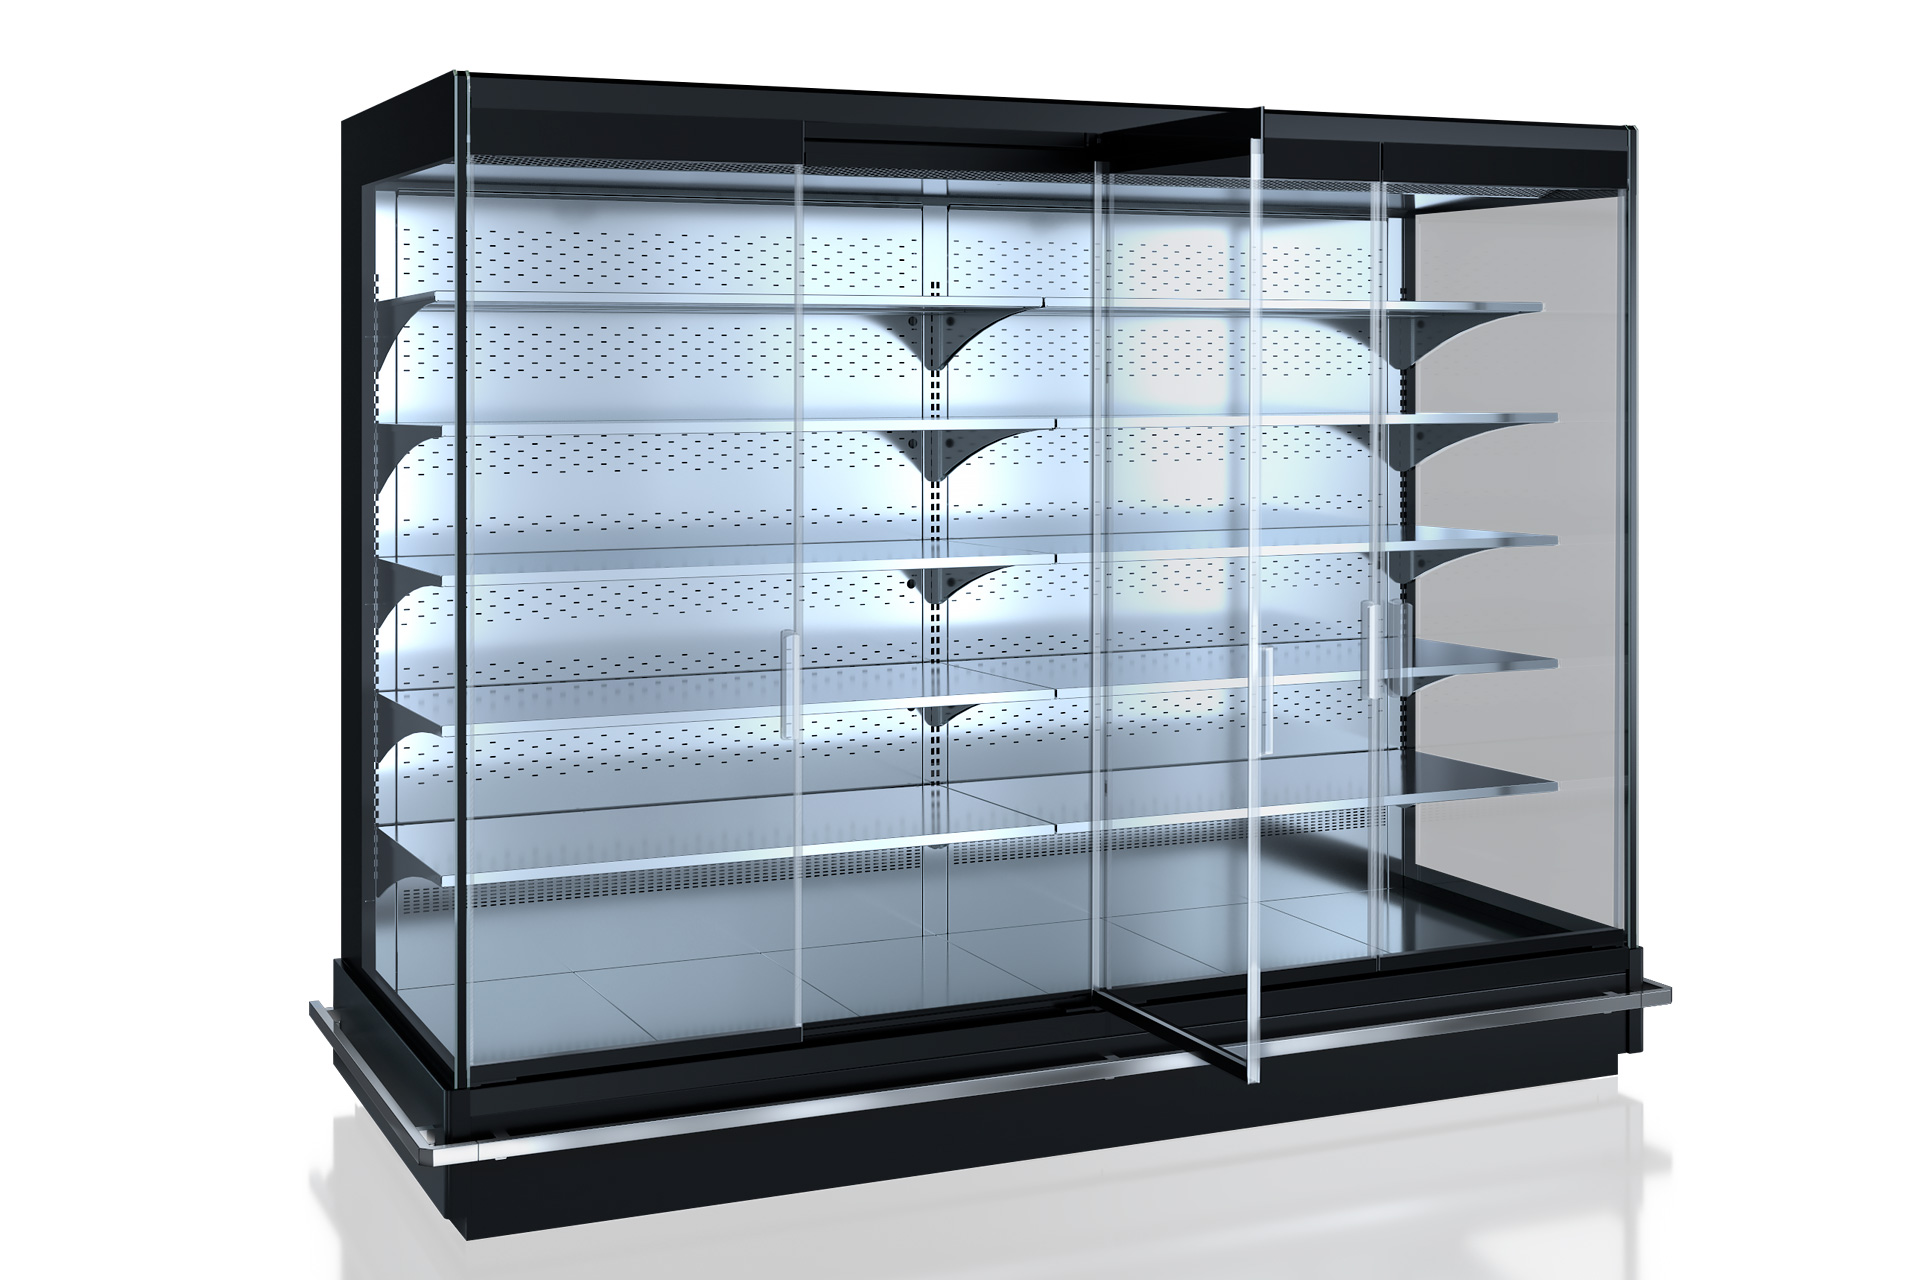 Refrigerated multideck cabinets Indiana MV 105 MT D 205-DLM